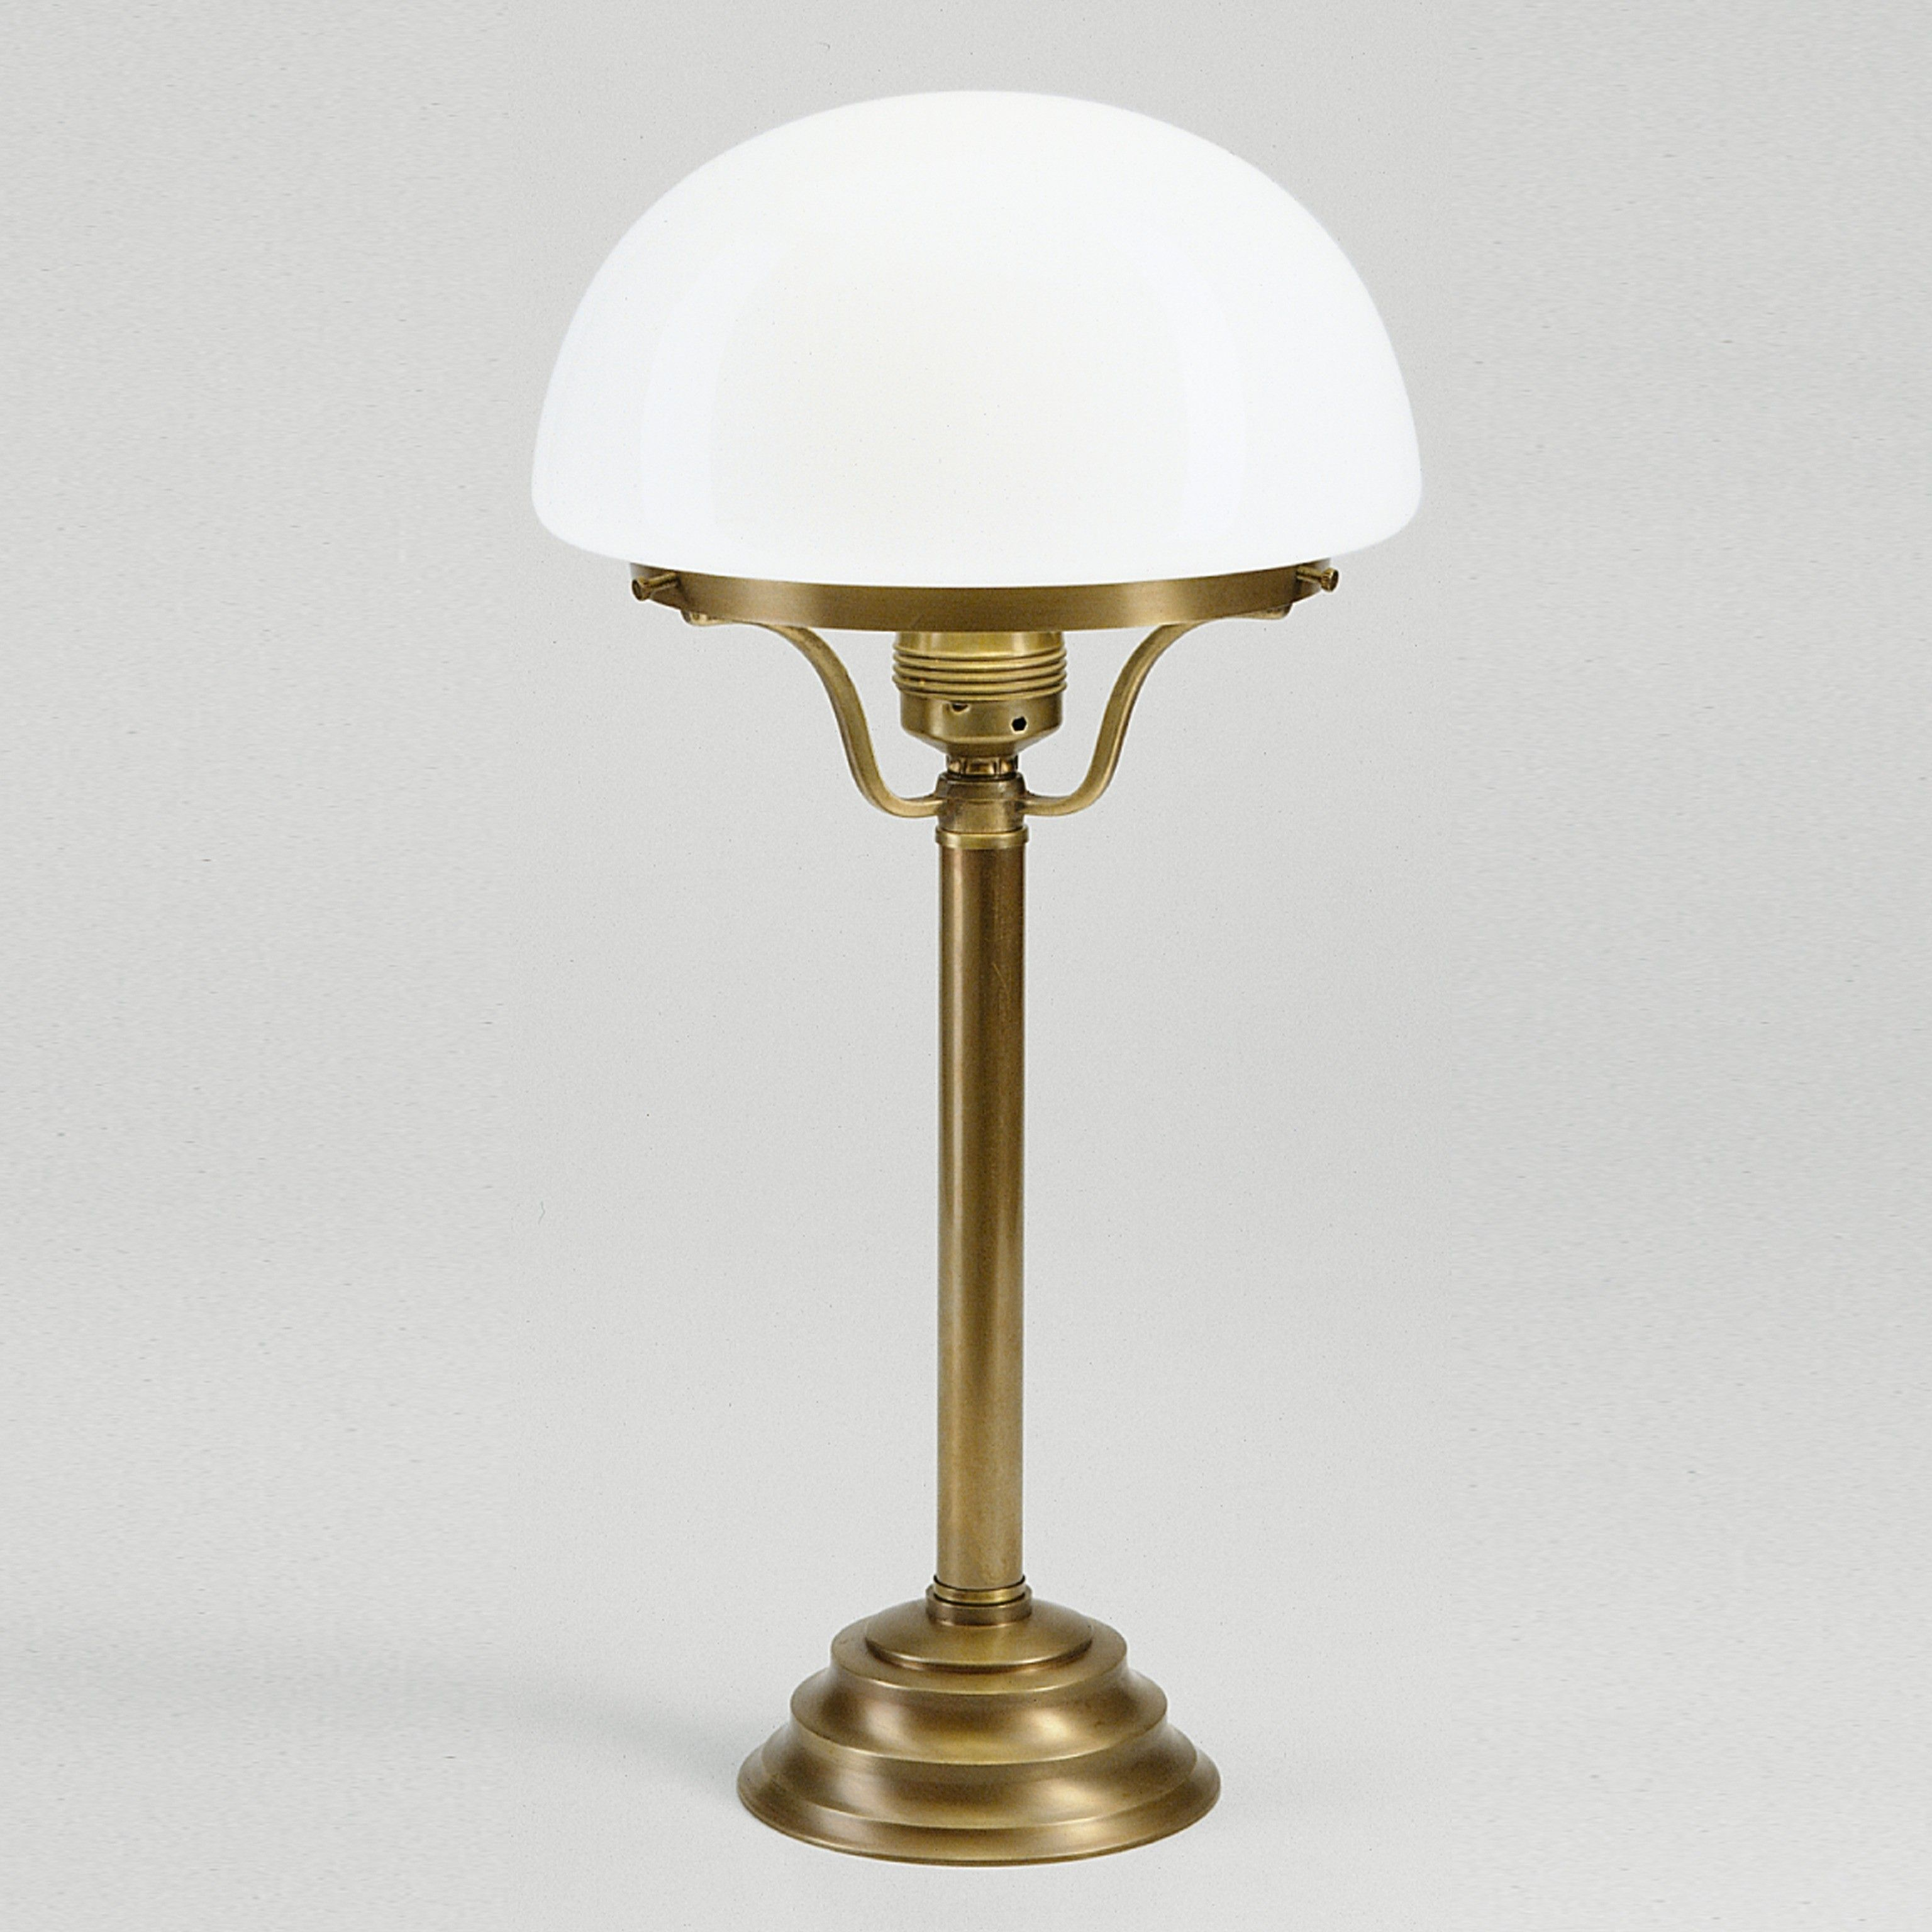 berliner messing tischlampe pilz bei. Black Bedroom Furniture Sets. Home Design Ideas